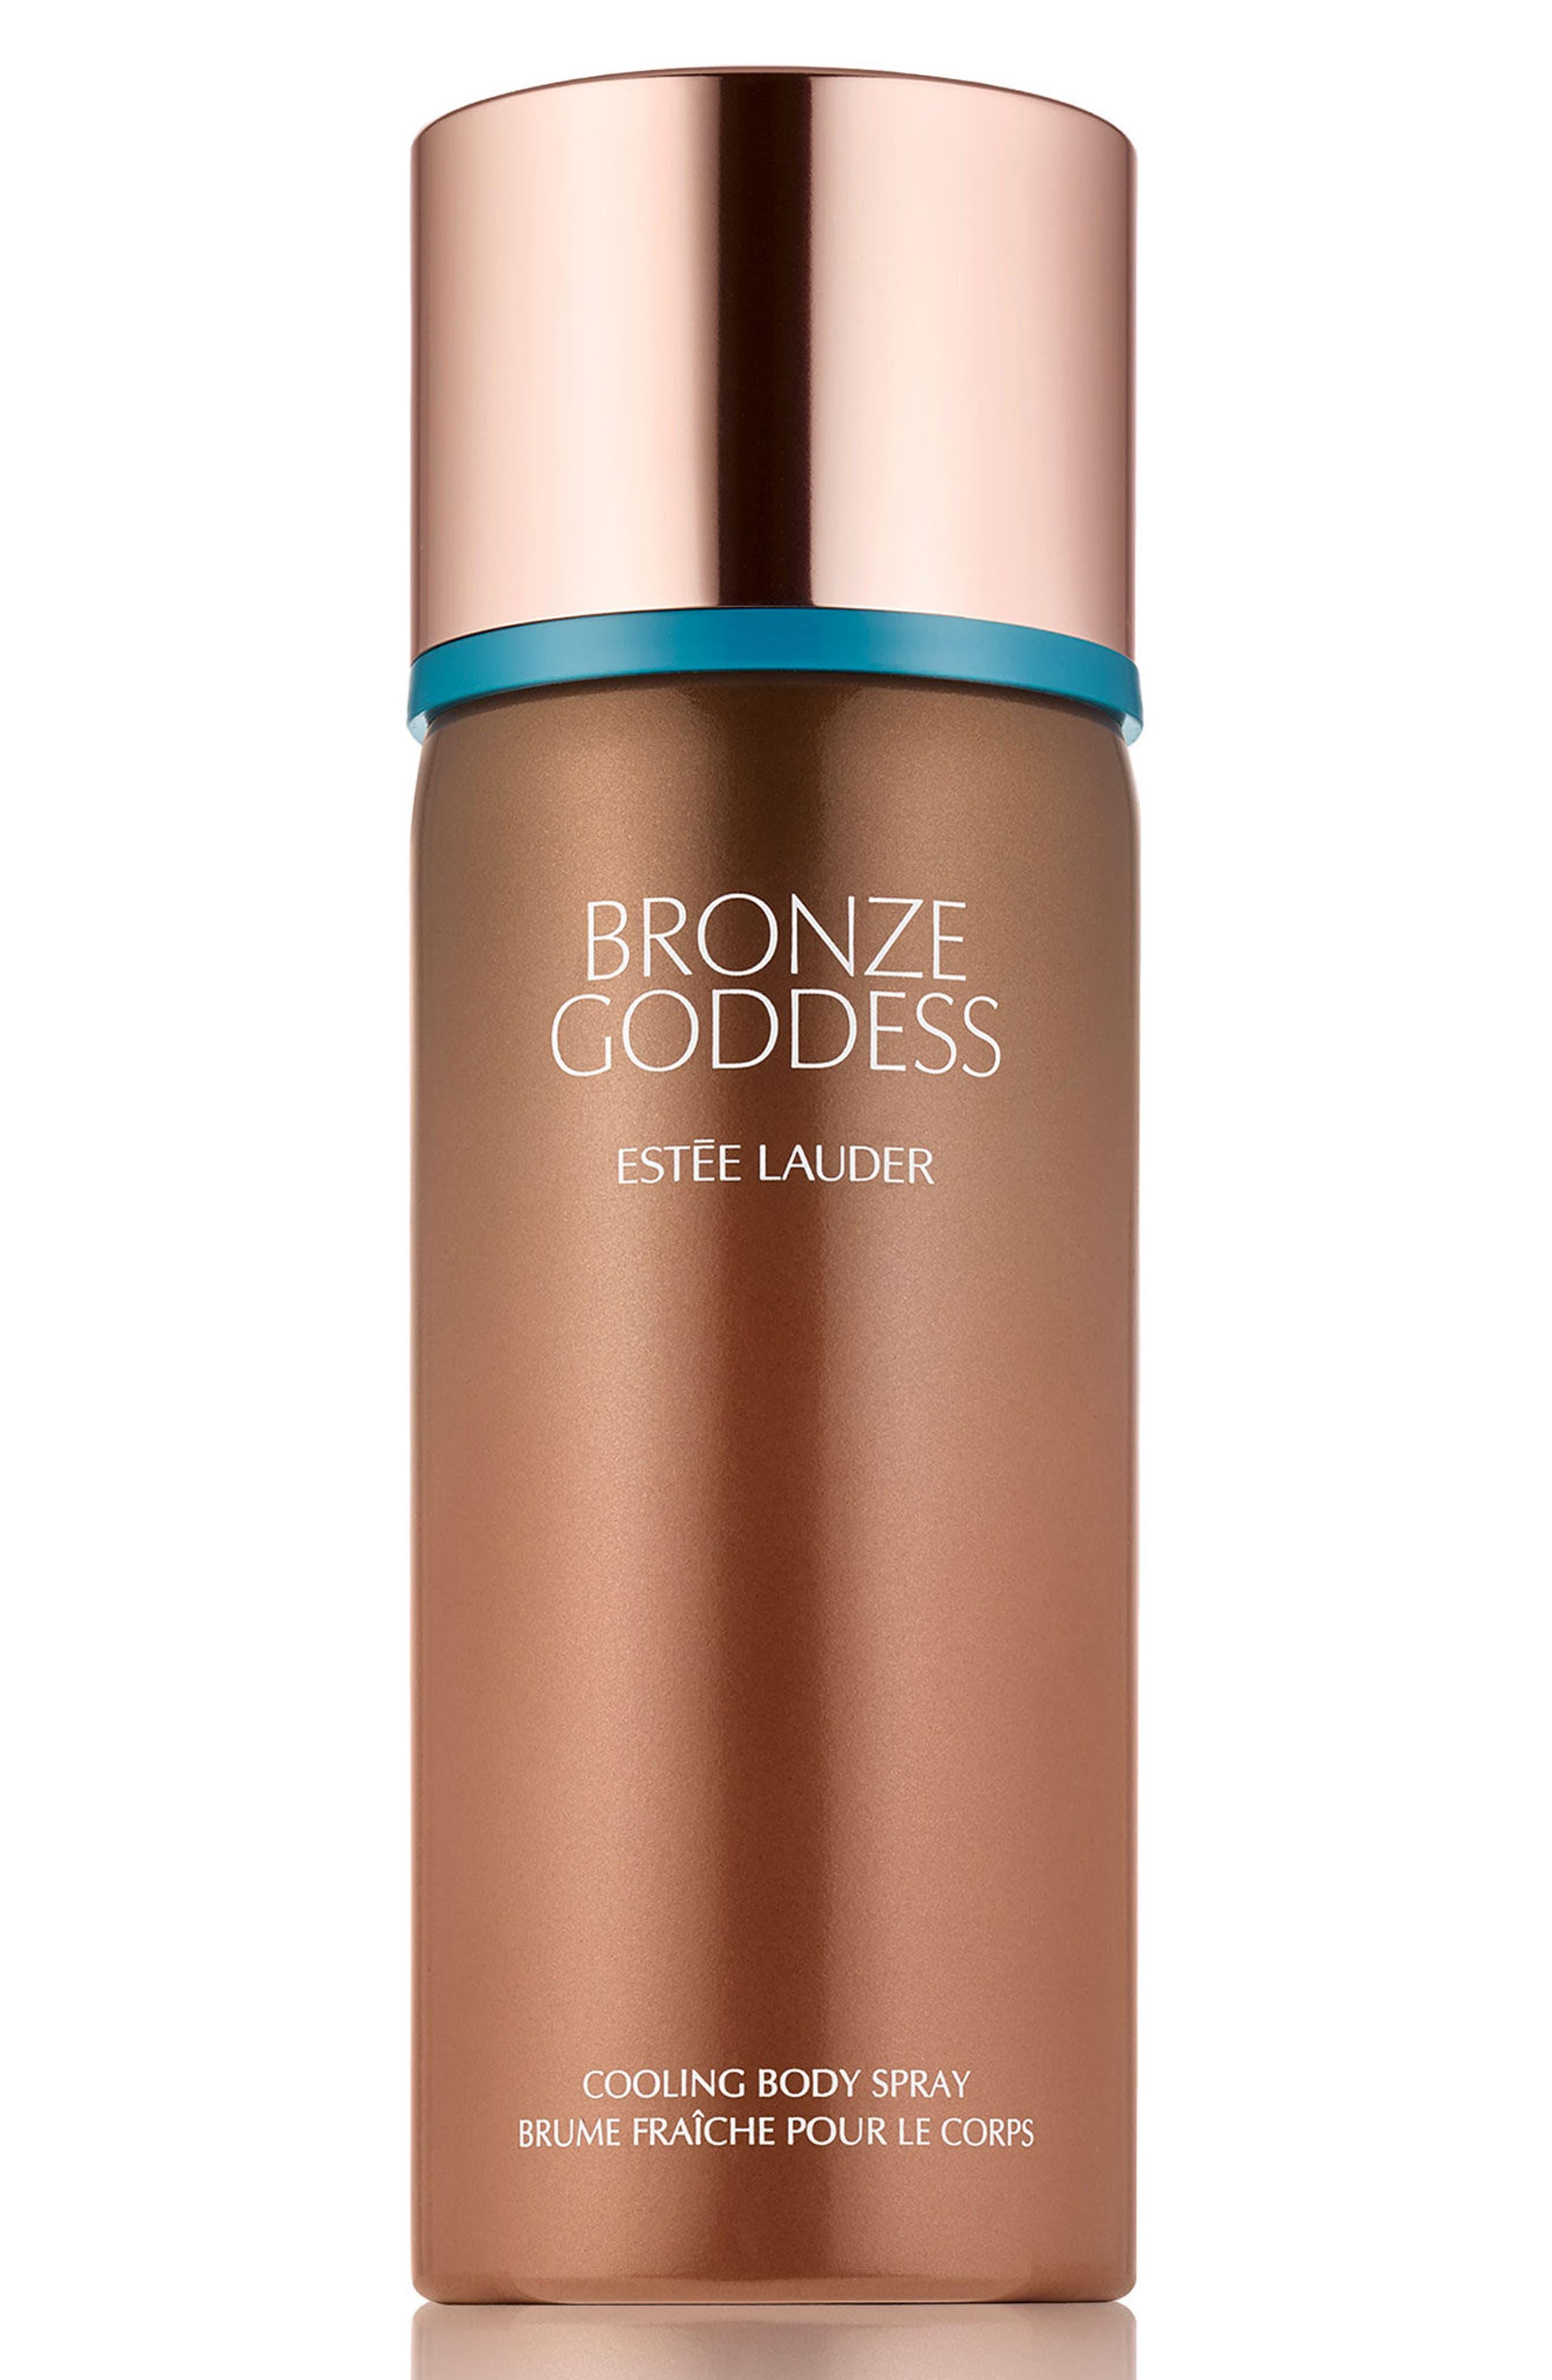 Estée Lauder Bronze Goddess Cooling Body Spray